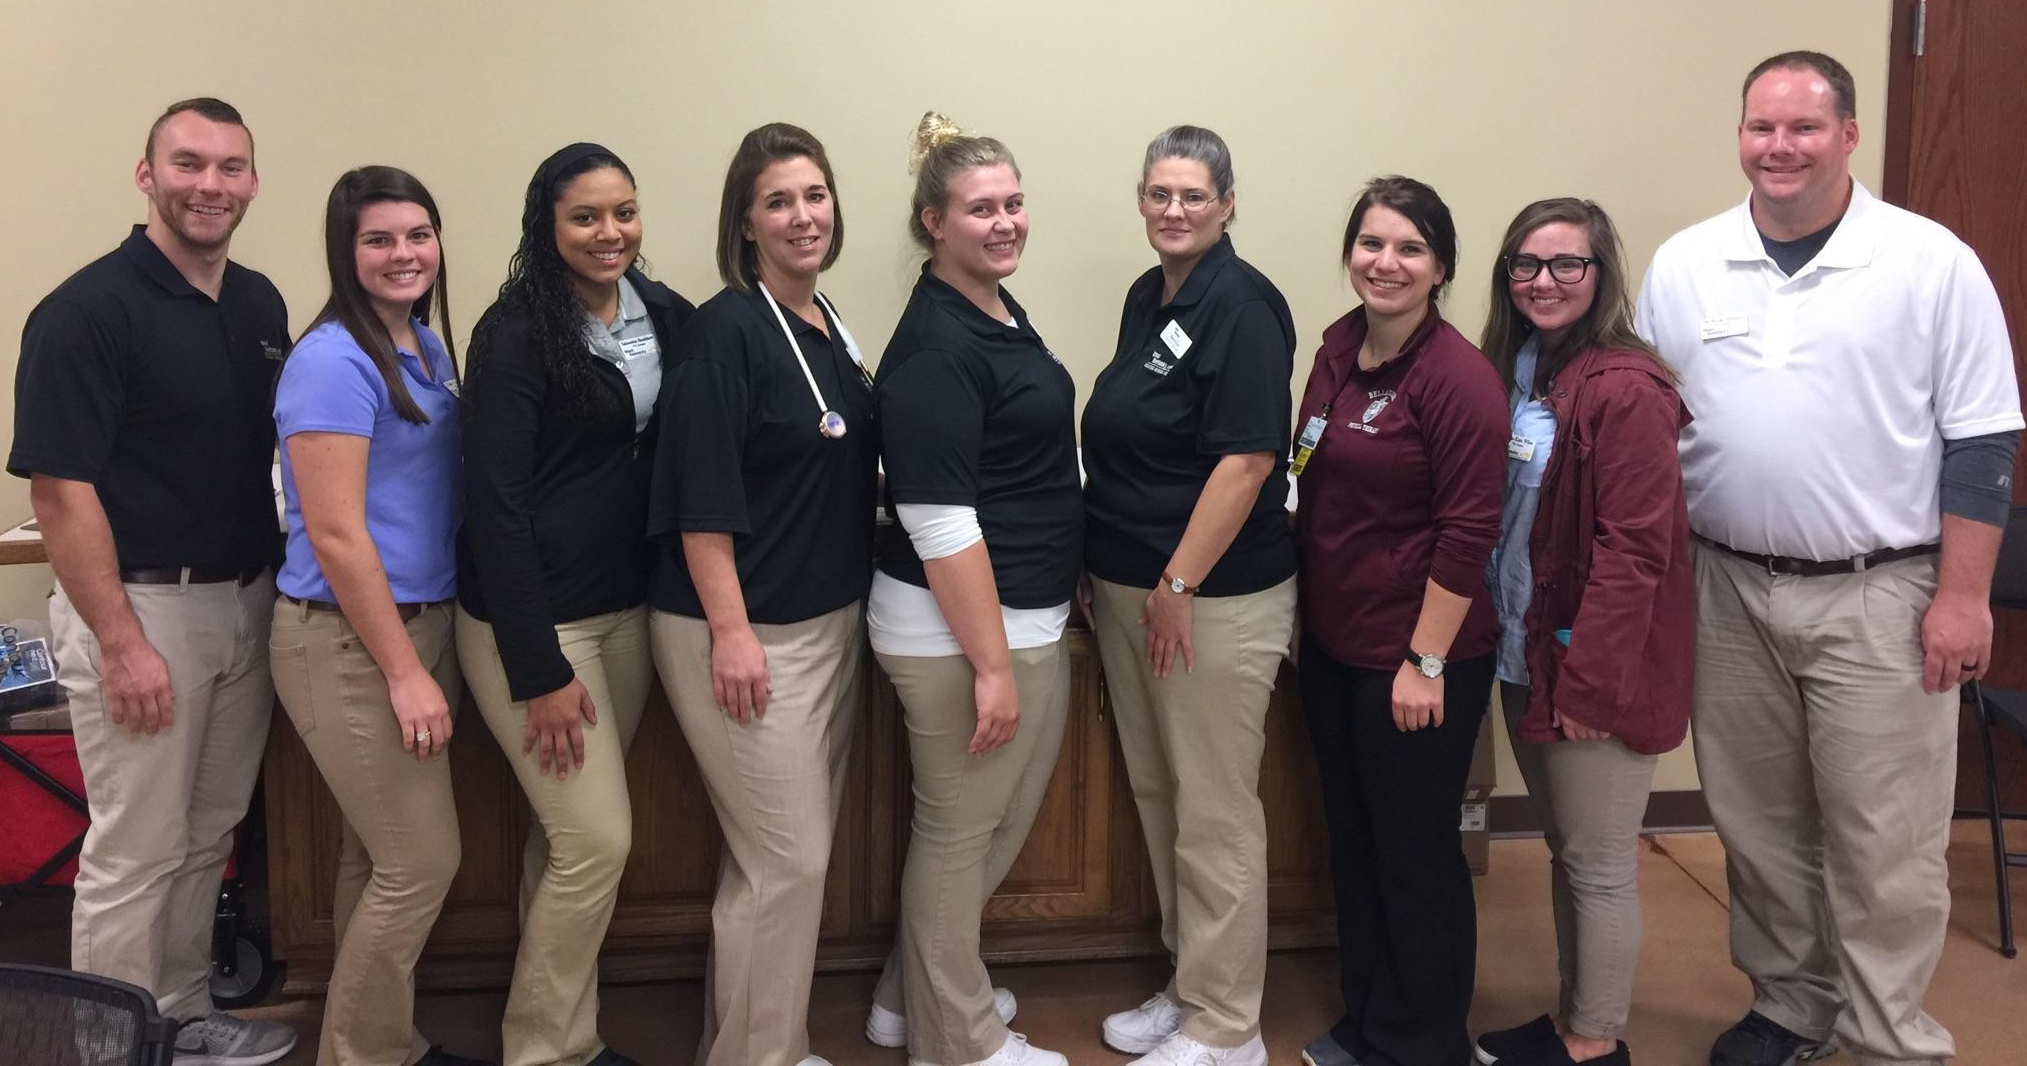 Wkctc nursing and pta students 2017 purchase area diabetes expo 1 copy